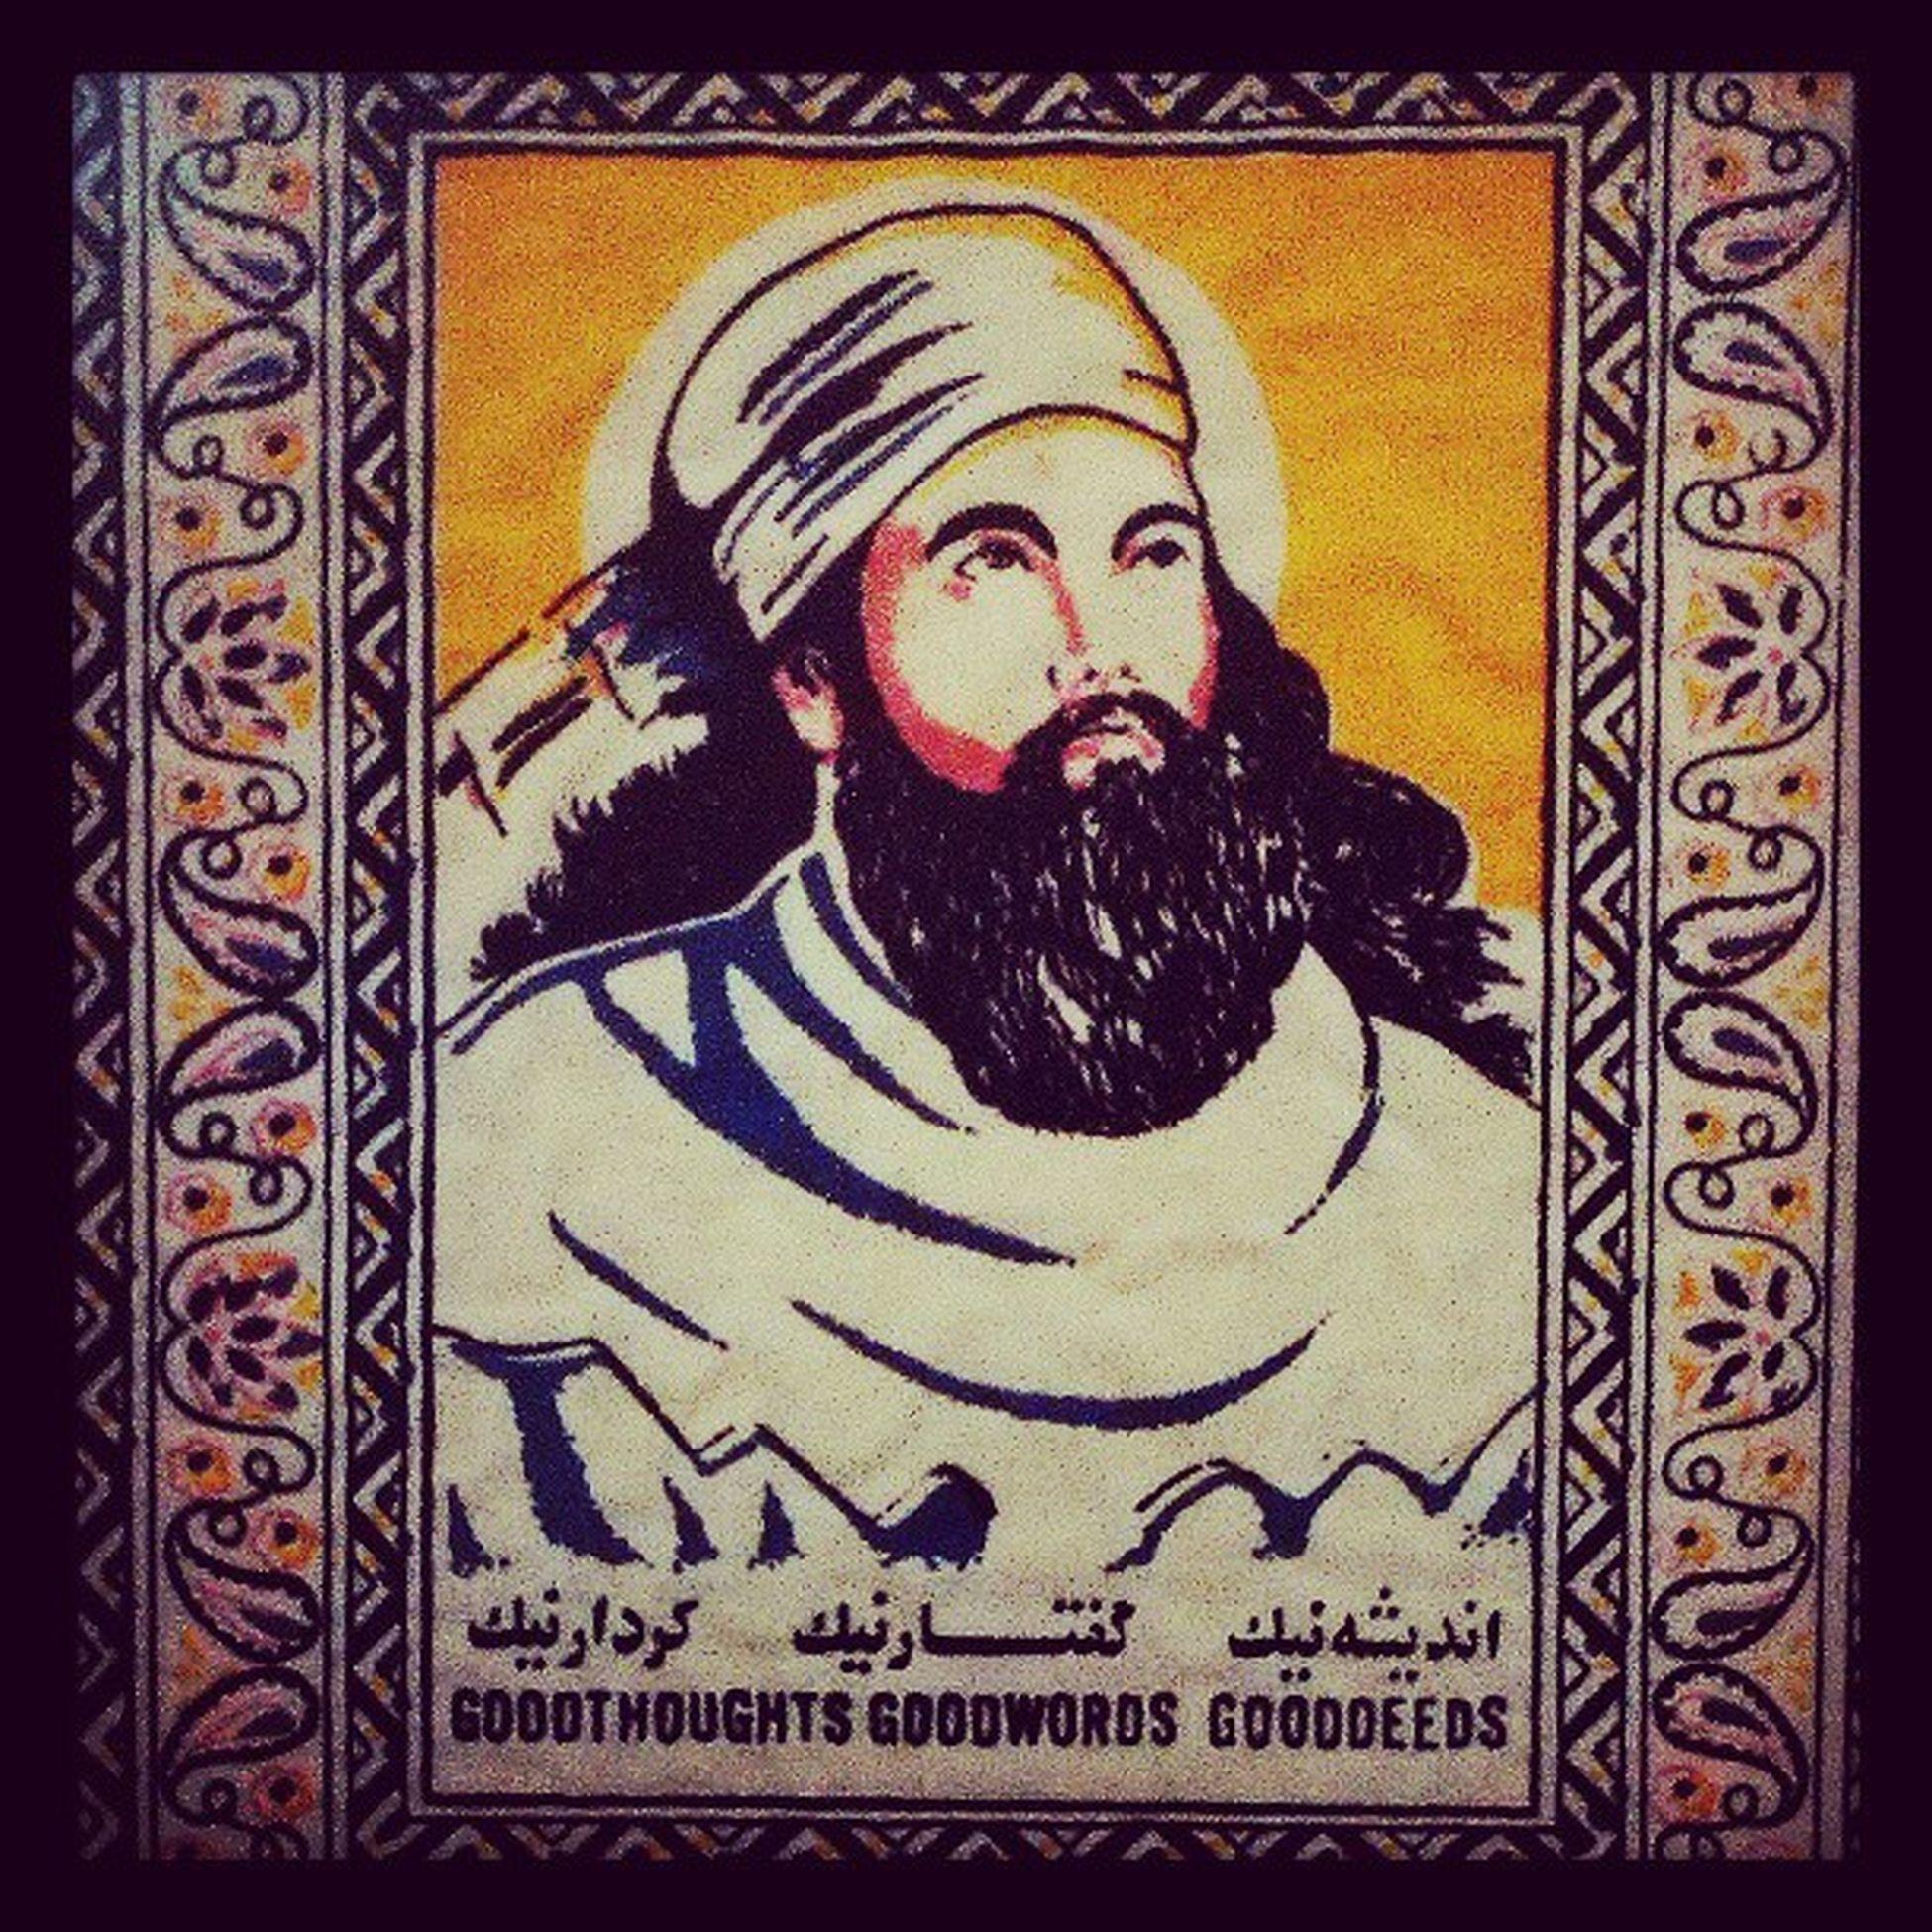 3G's Parsisaying Parsi Zoroastrian Zarathustra instasayings loveparsis framed onthewall friendshouse withafriend mumbai instaparsi instalove sayings belief fortheworld